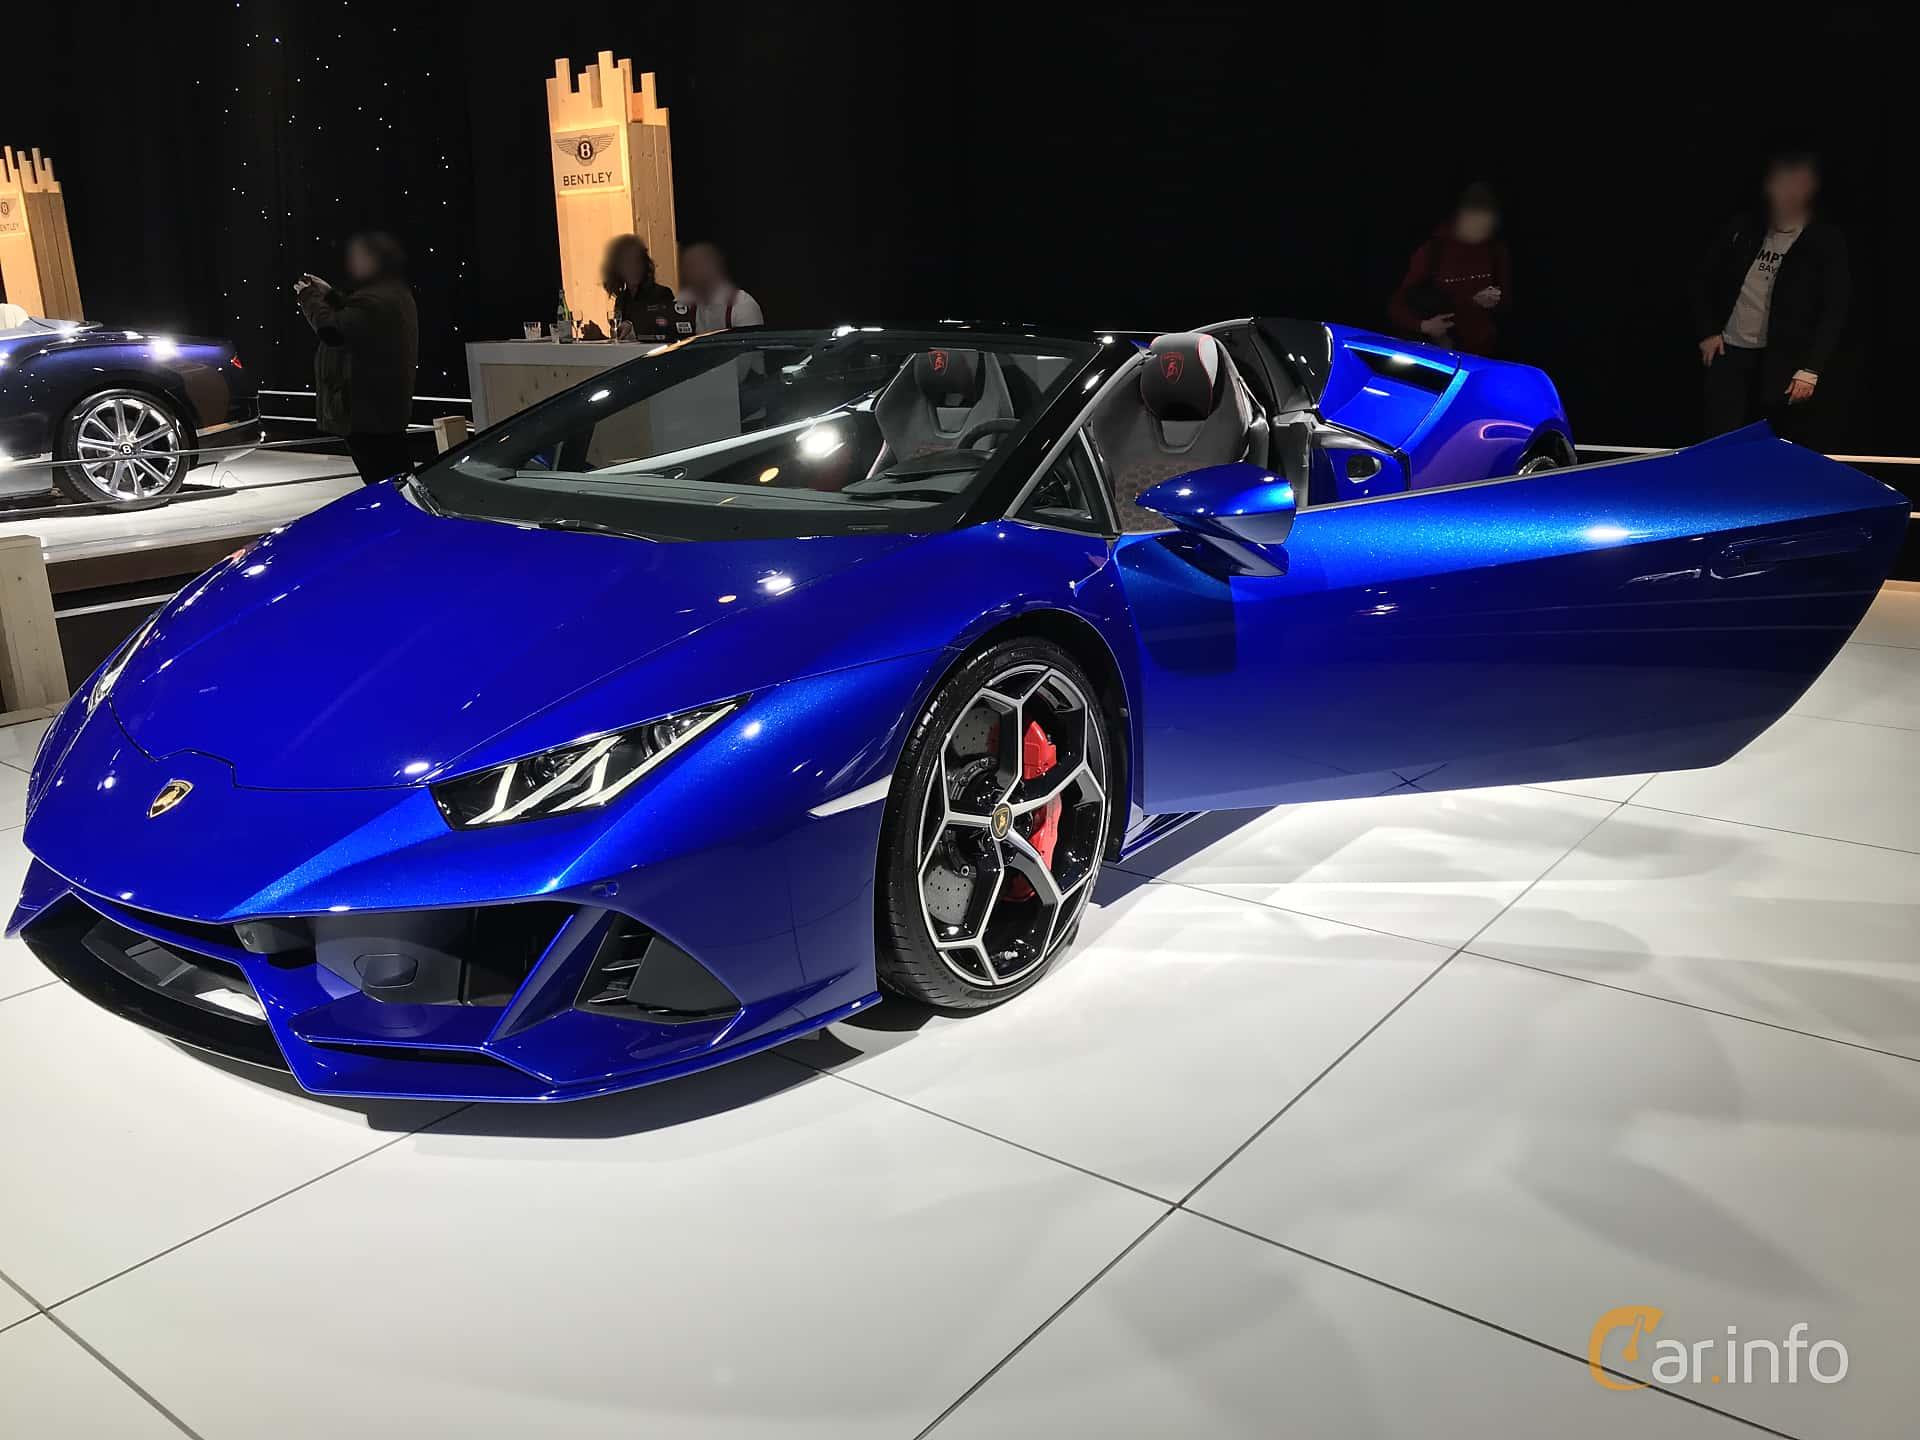 13 Images Of Lamborghini Huracan Evo Spyder Dct 640hp 2020